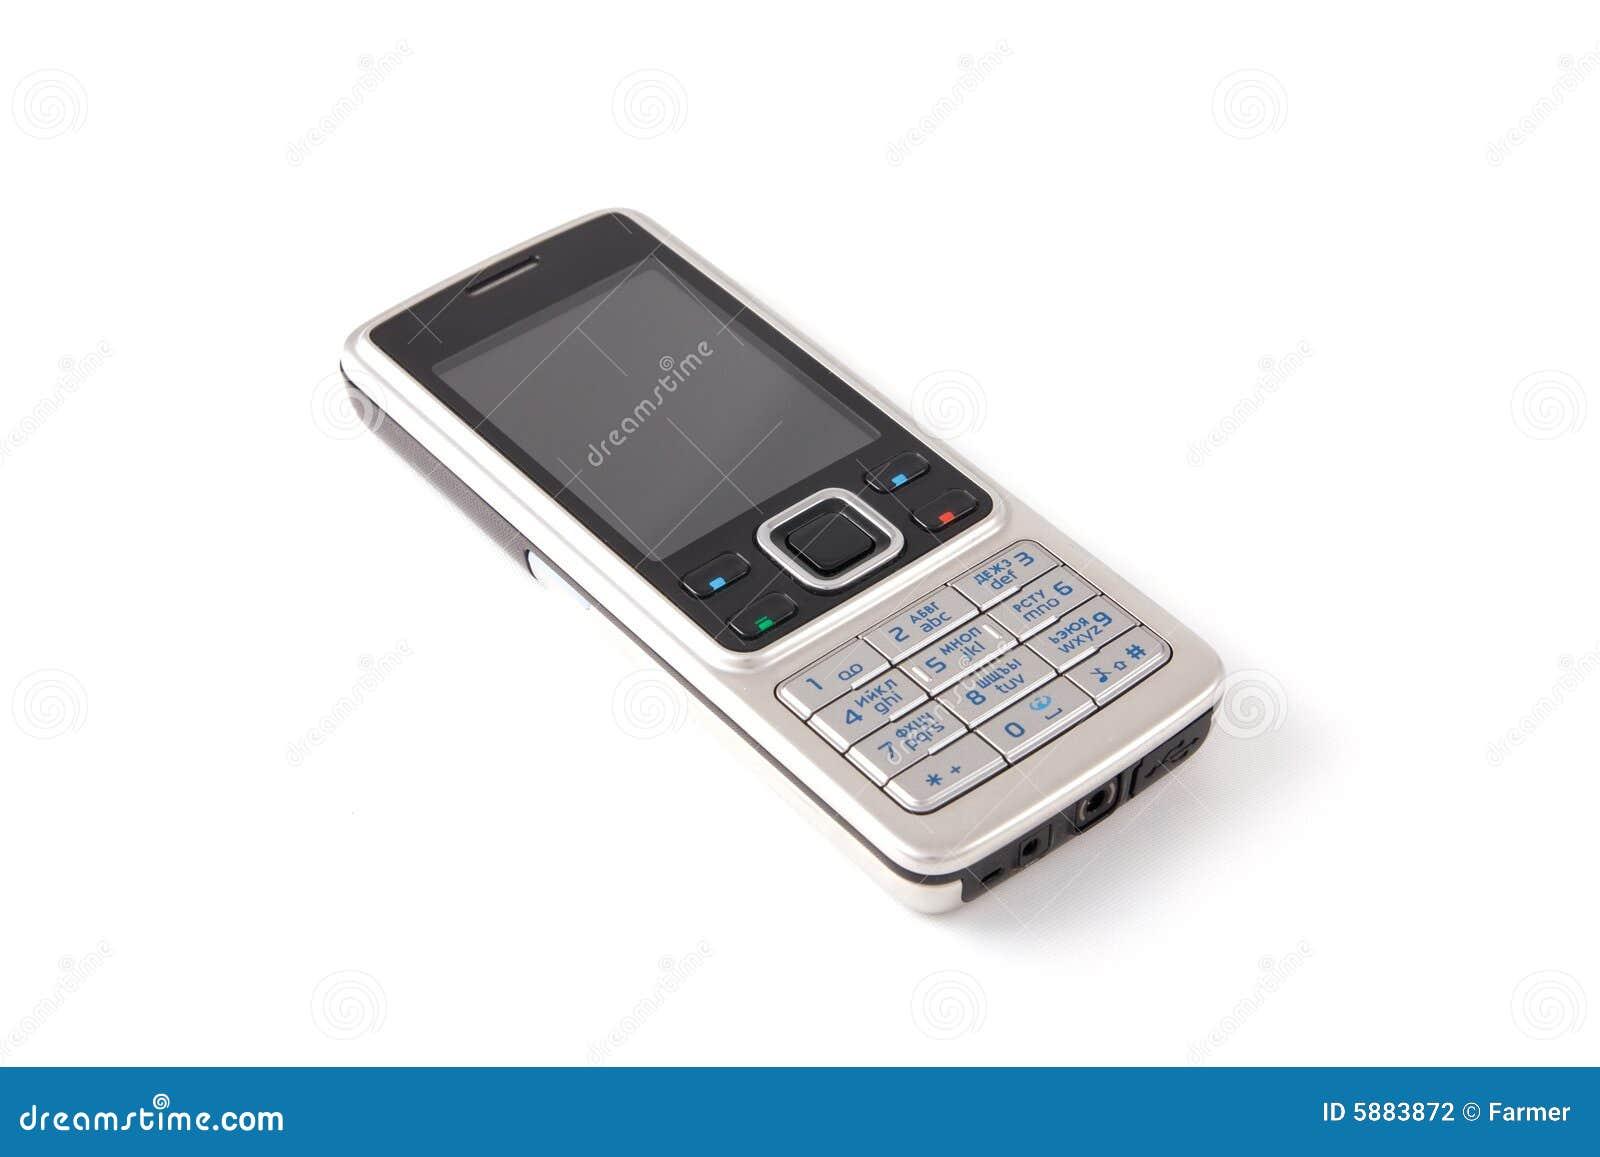 mobile telephone stock photography image 5883872. Black Bedroom Furniture Sets. Home Design Ideas